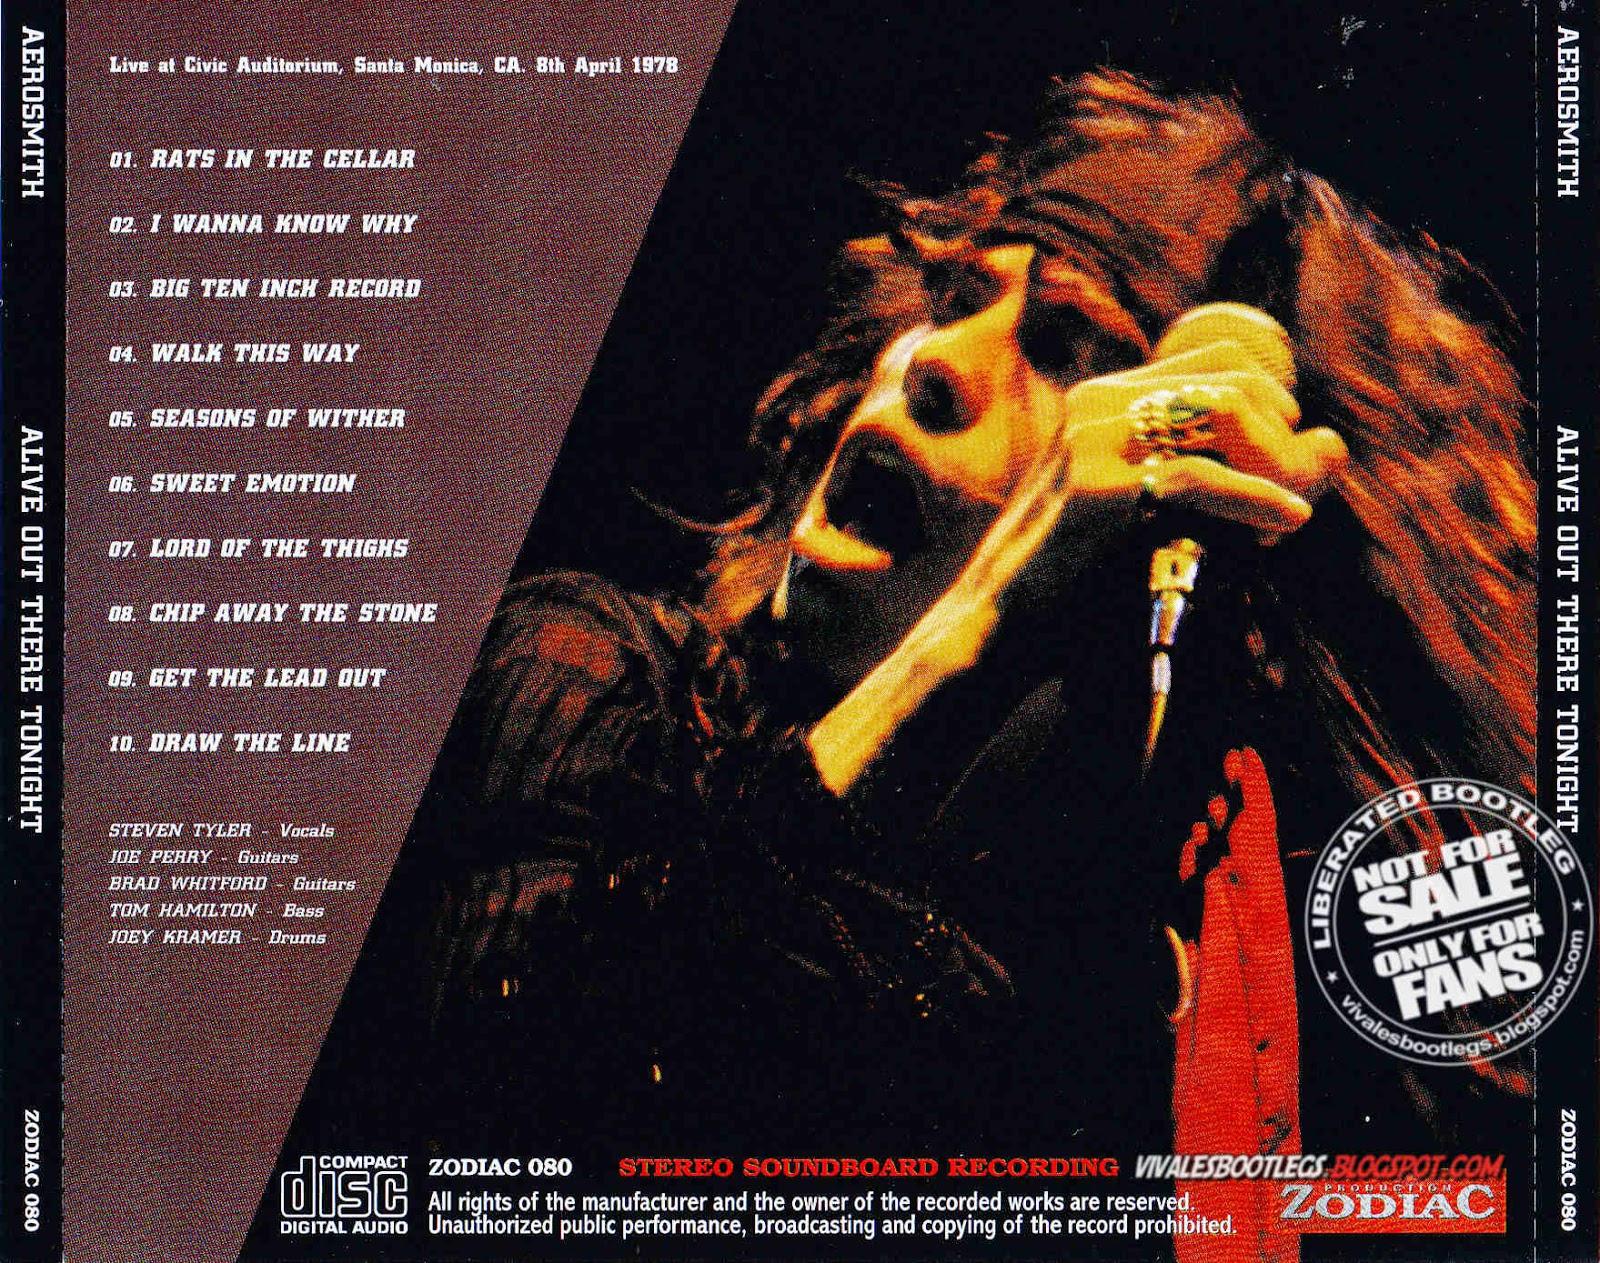 Aerosmith live bootleg album cover not